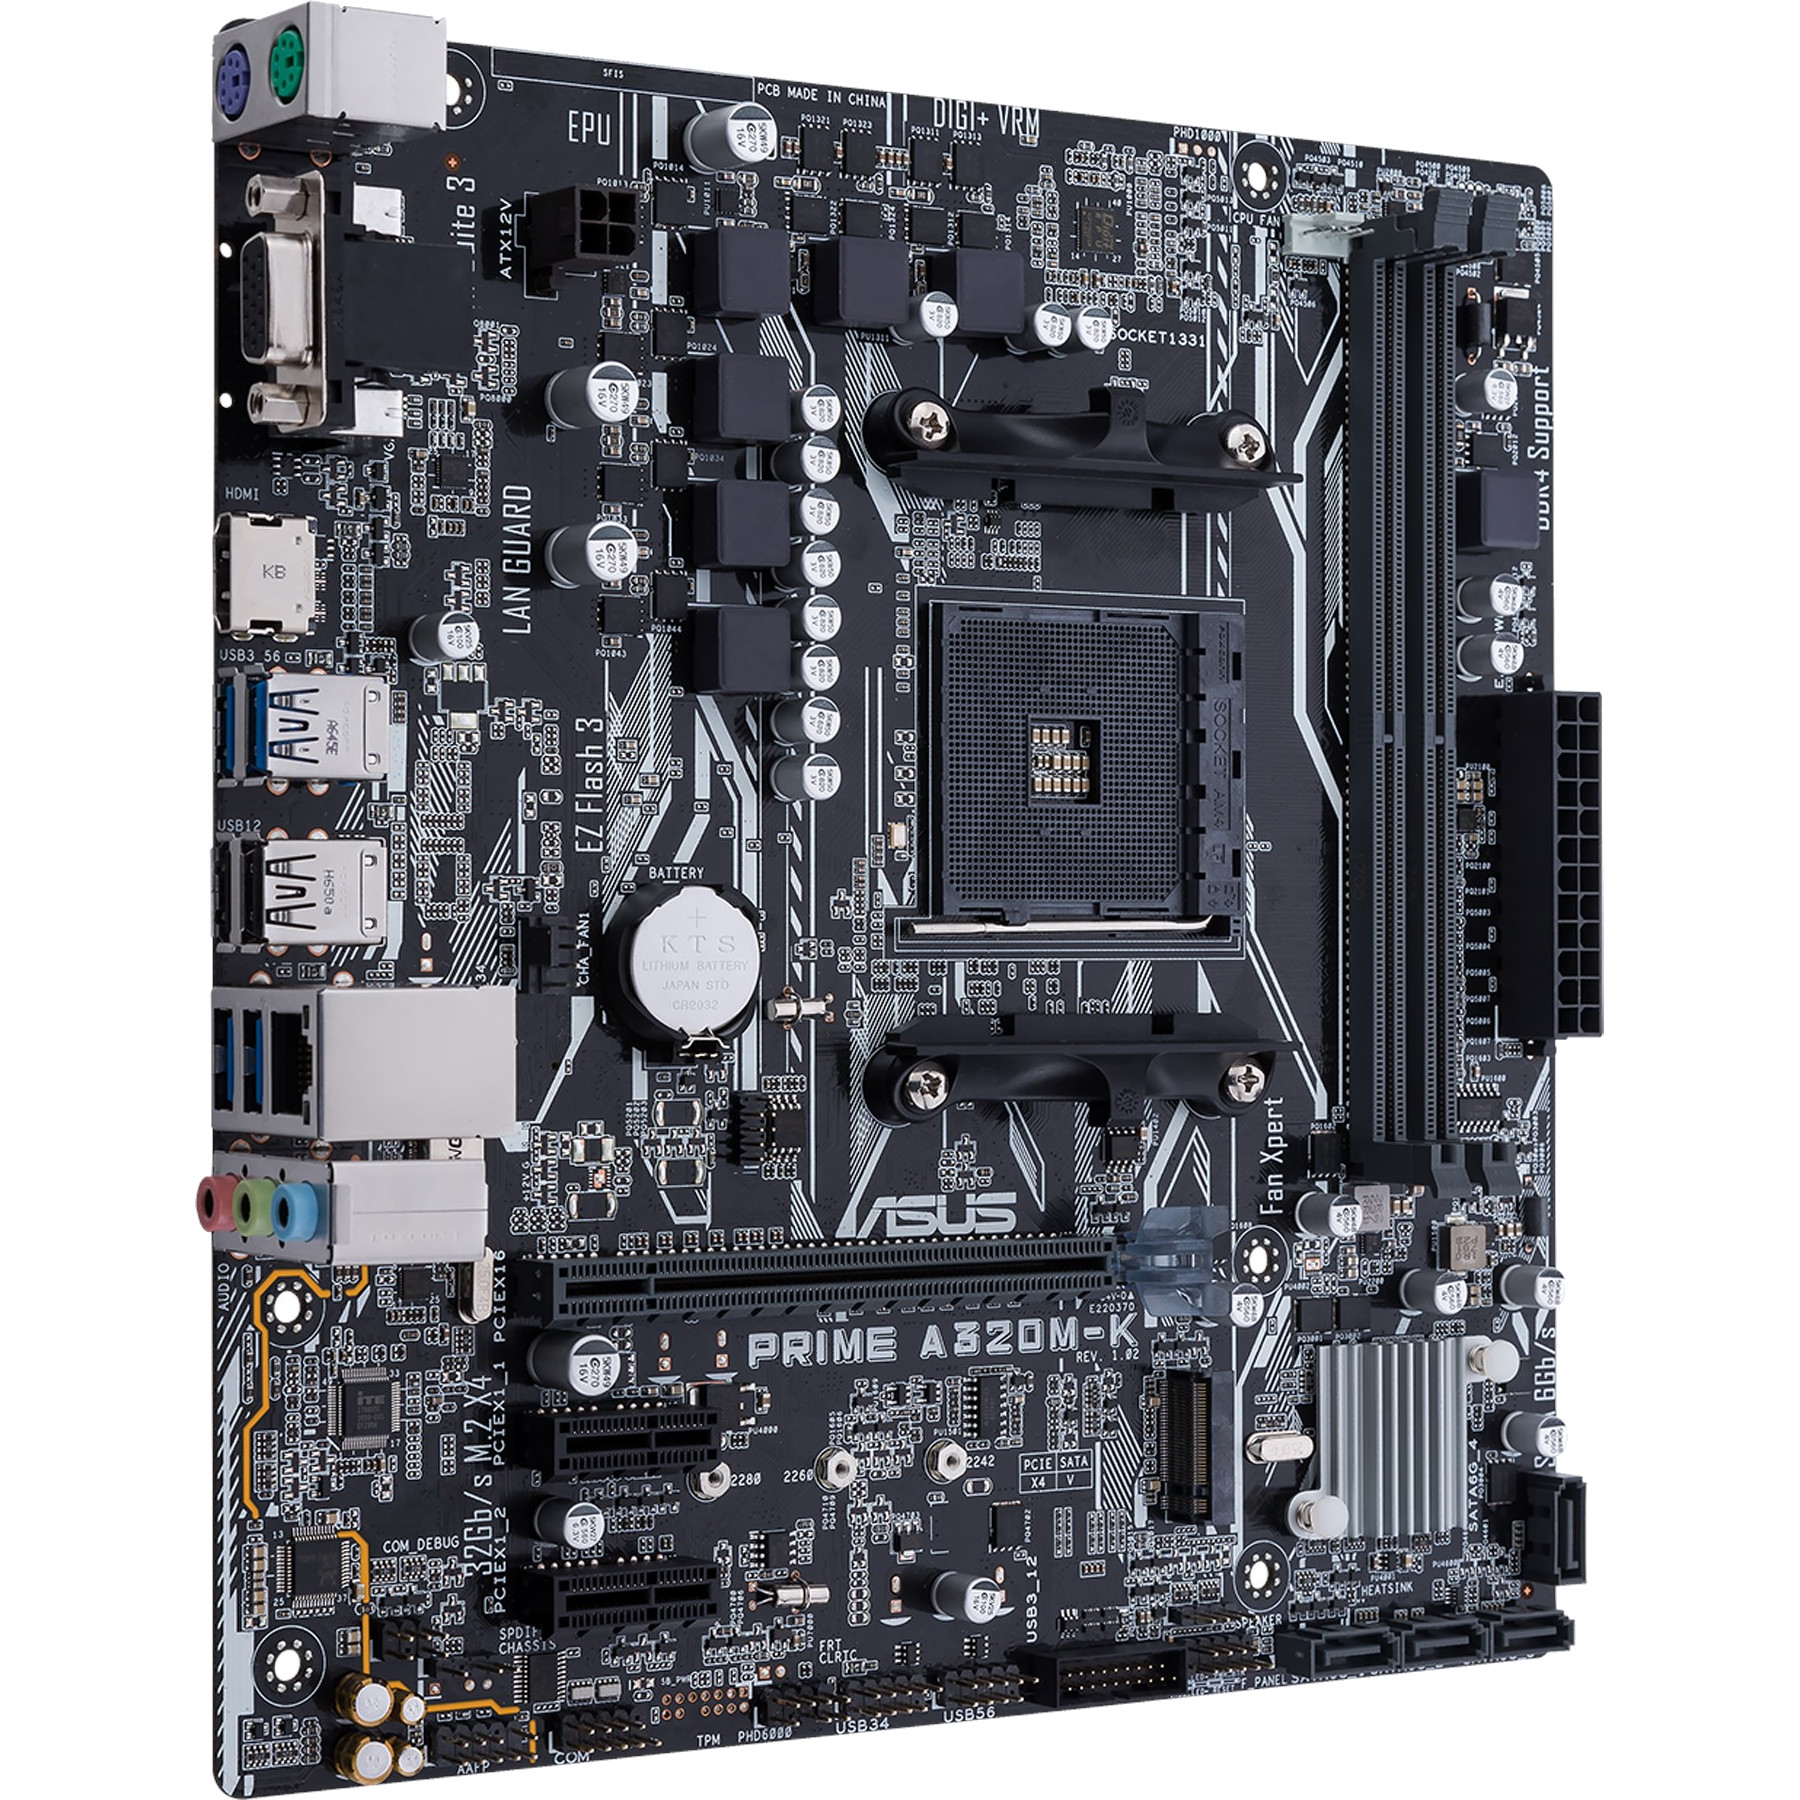 ASUS Prime A320M-K AMD Ryzen AM4 DDR4 HDMI VGA M.2 USB 3.1 Micro-ATX A320 Motherboard